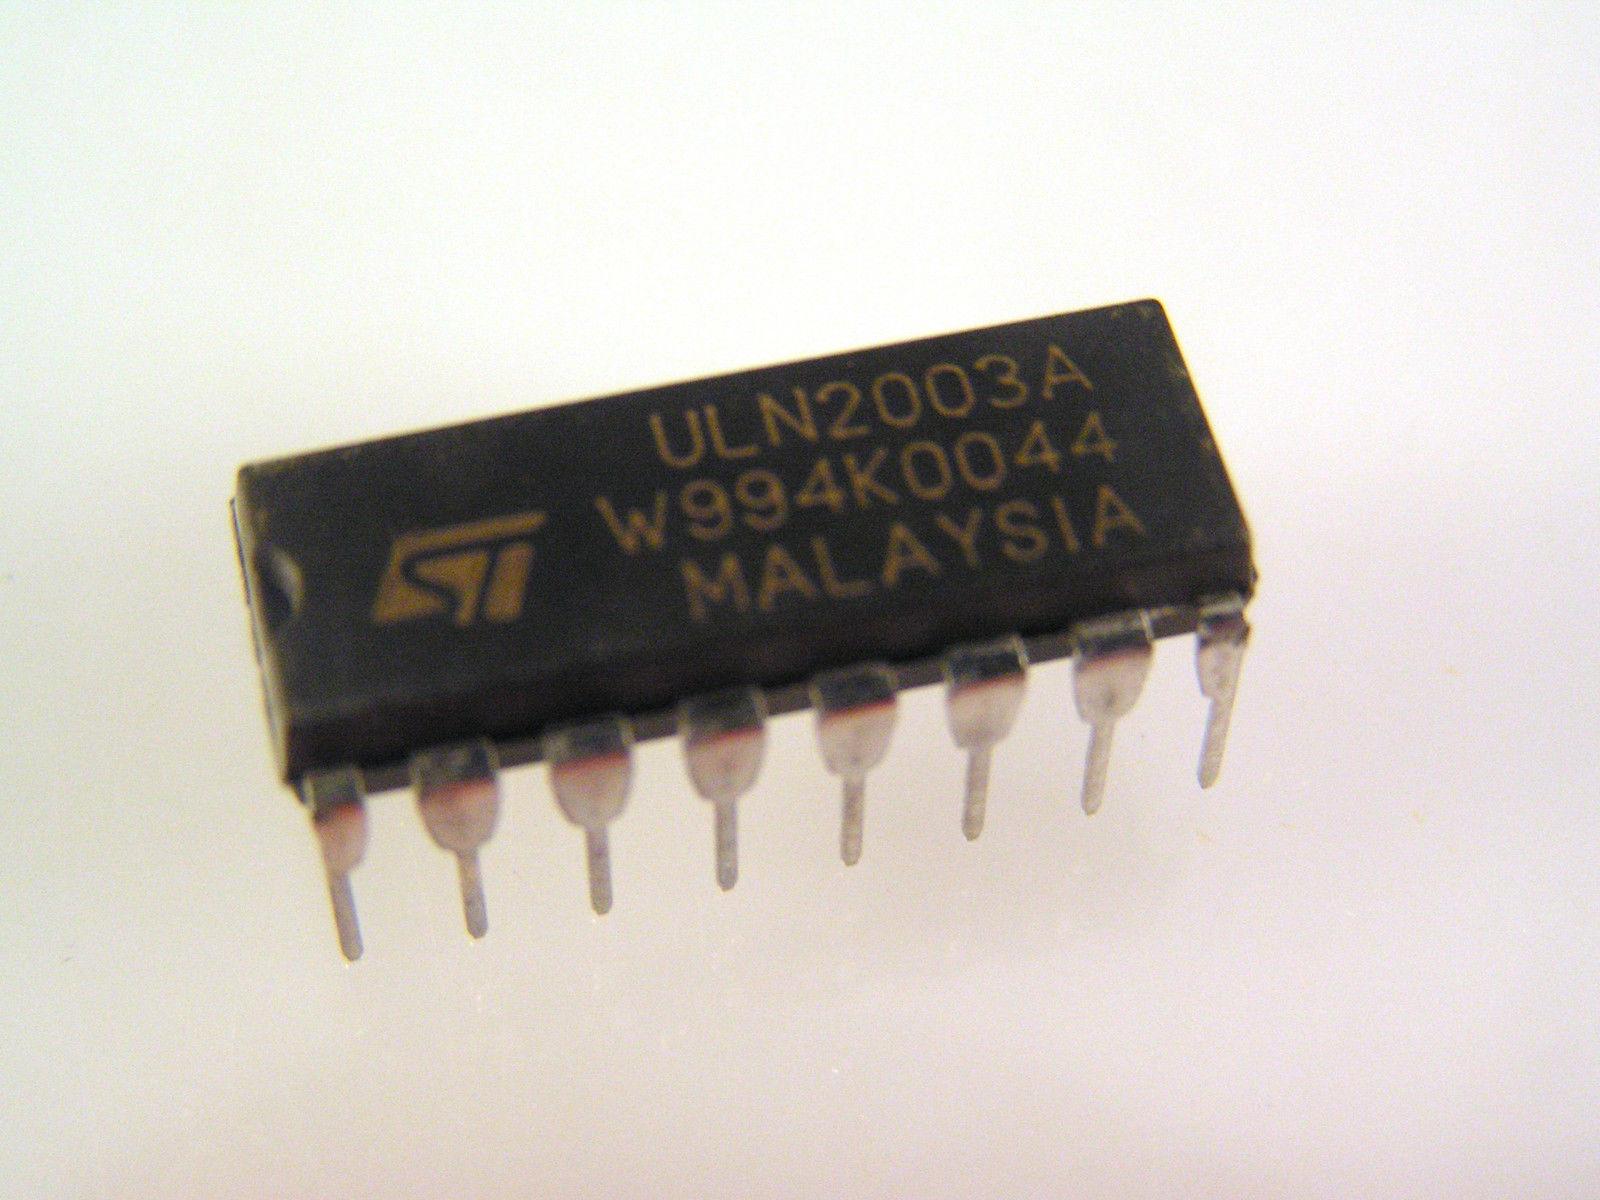 St Uln2003a Darlington Transistor Array 16dil Ic Date 2000 New Old Thedarlingtonpaircircuitjpg Stock Om035a